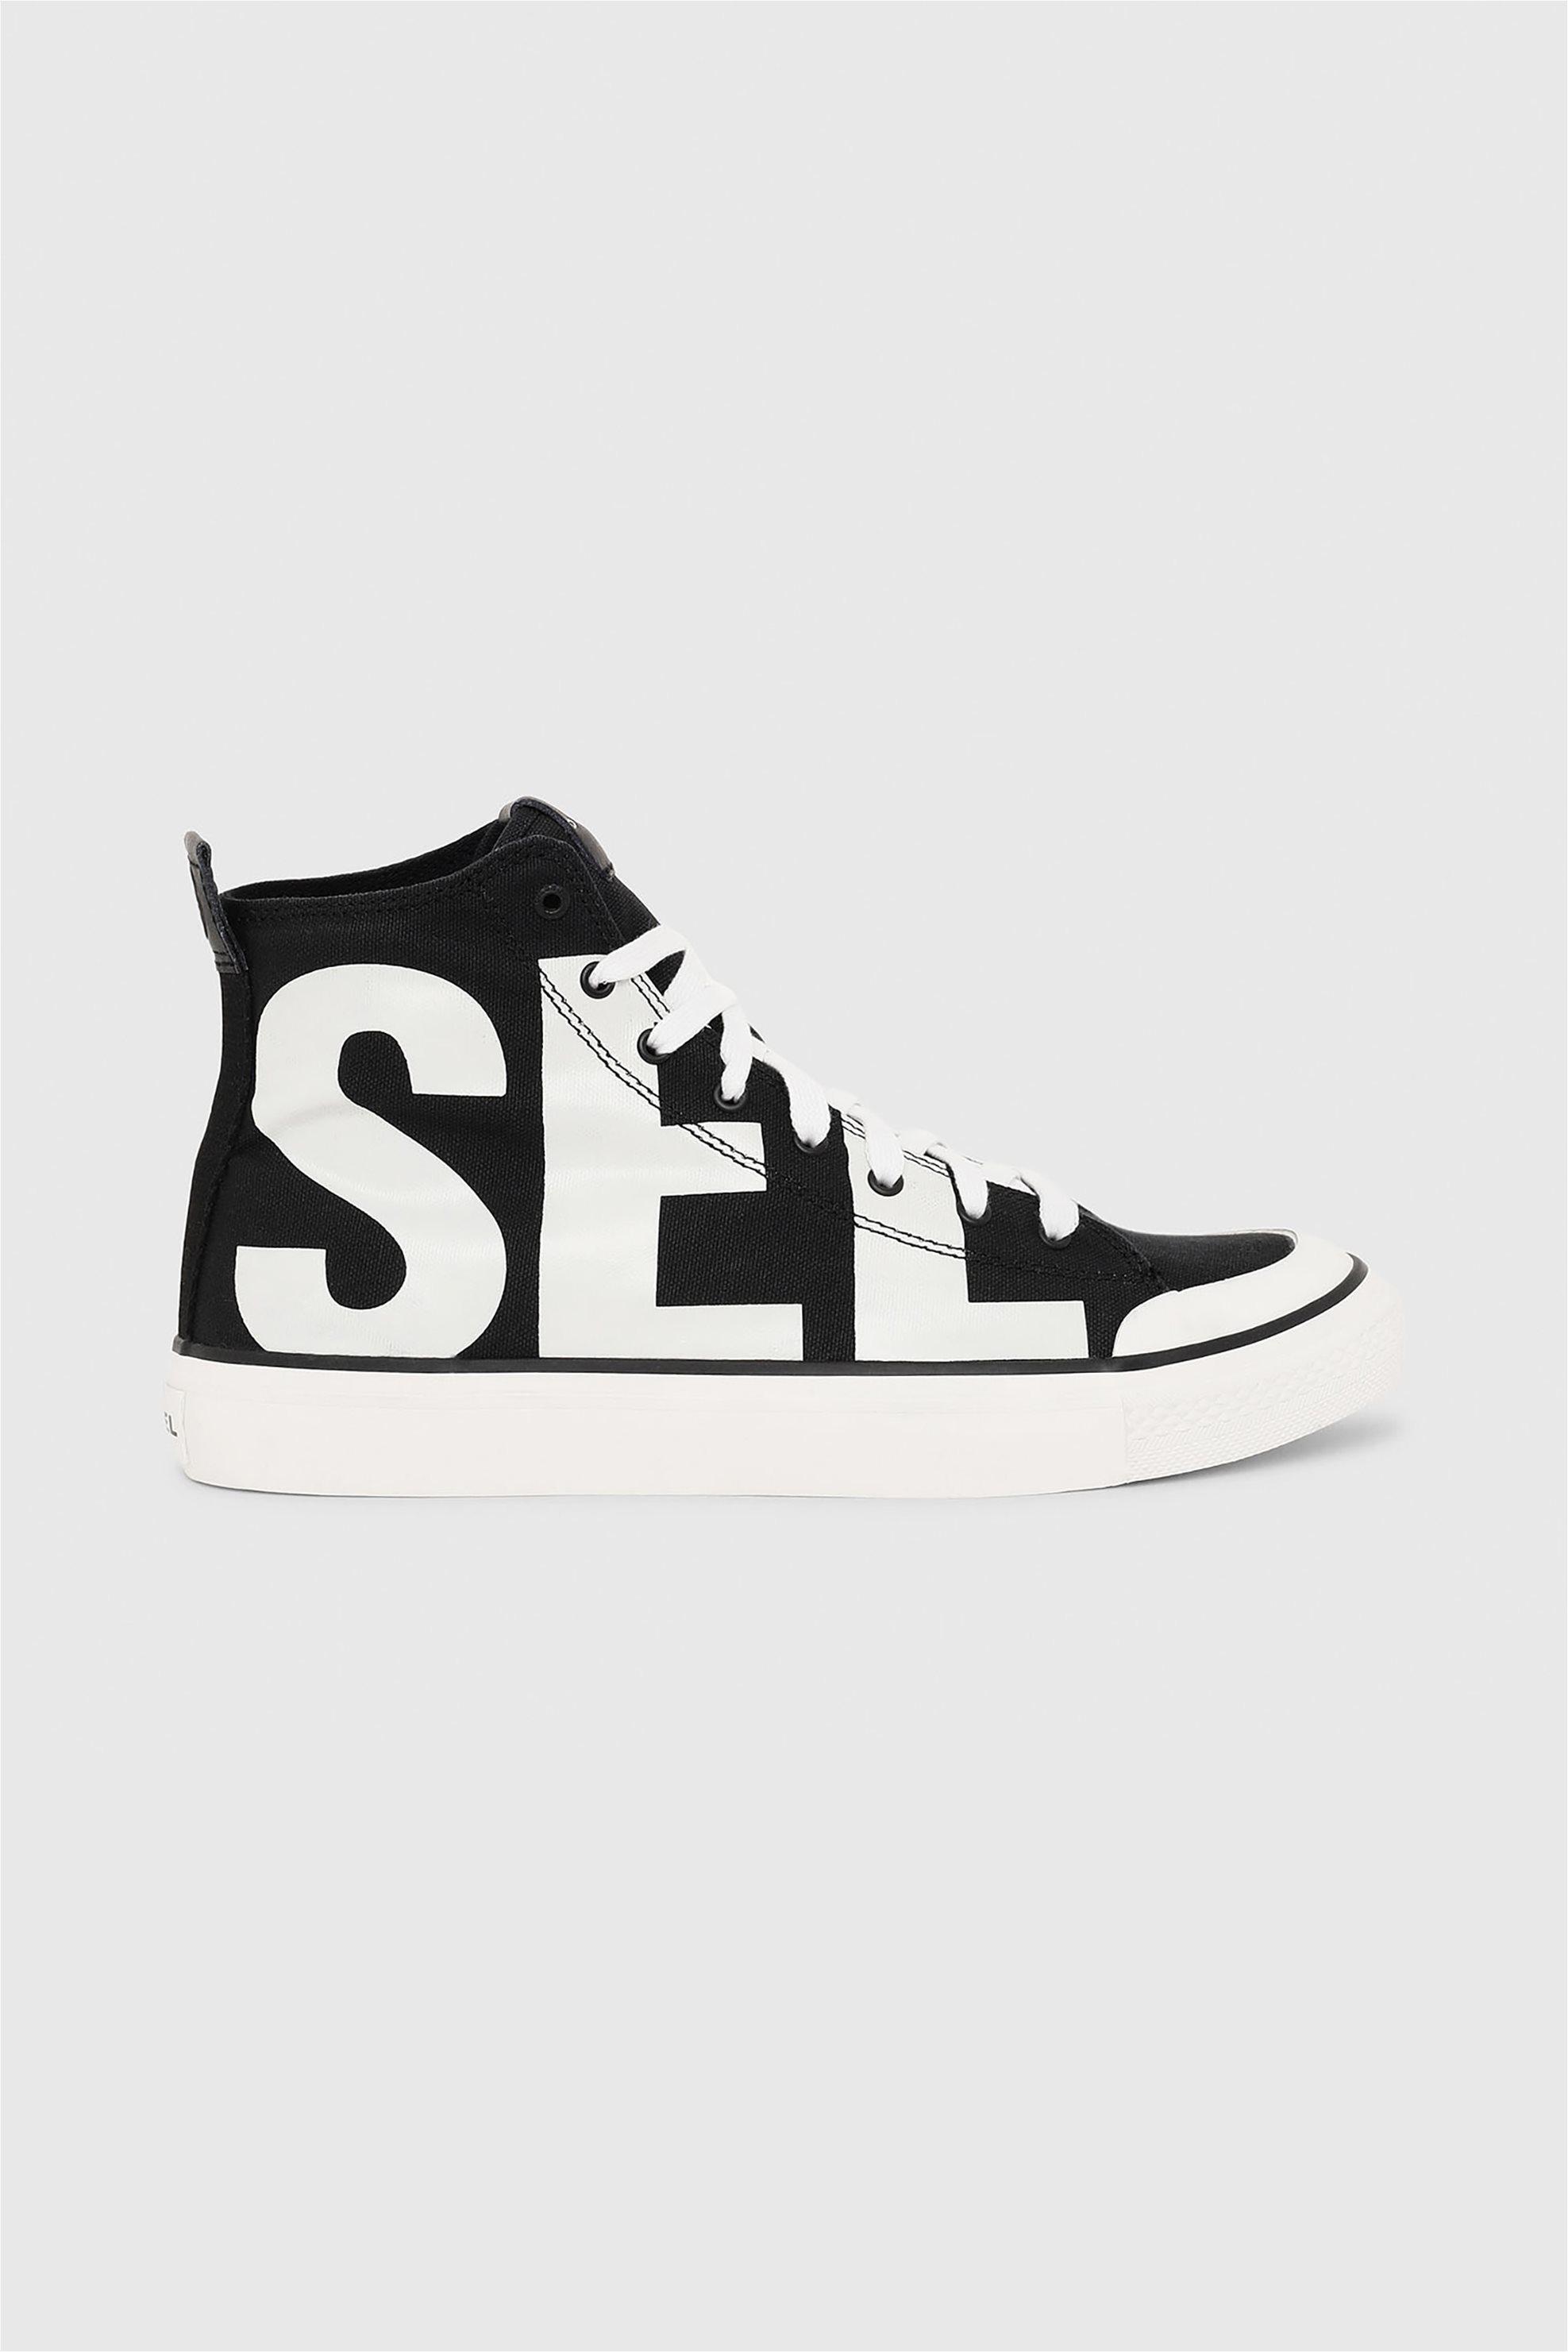 Diesel ανδρικά sneakers μποτάκια με logo print – Y01993 P2468 – Μαύρο